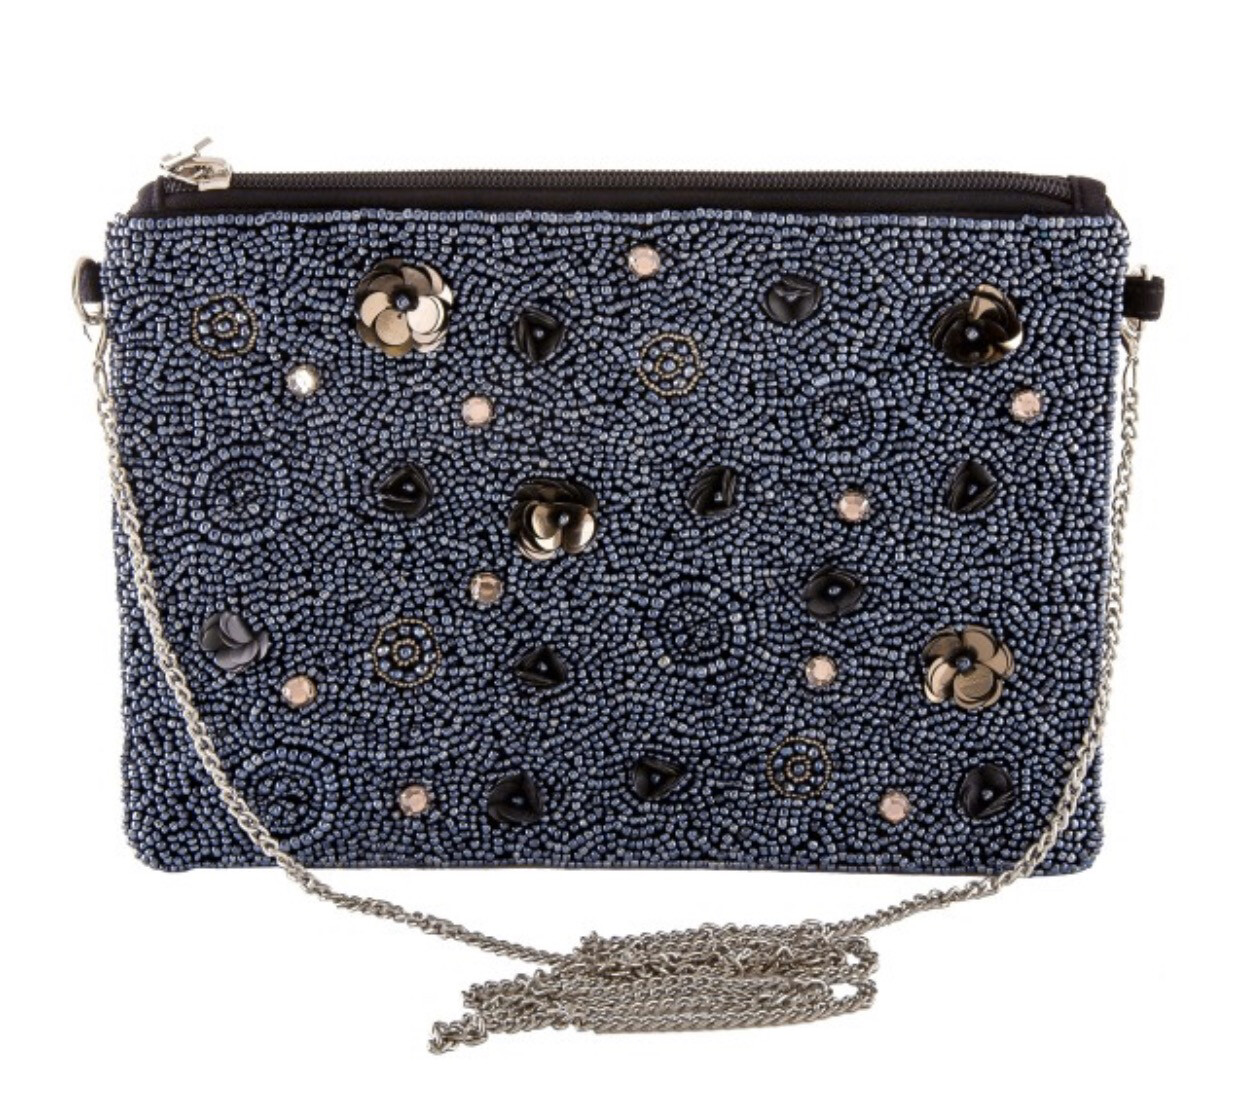 High Quality Hematite Seed Beaded Handbags/ Sequin Flowers & Rhinestones